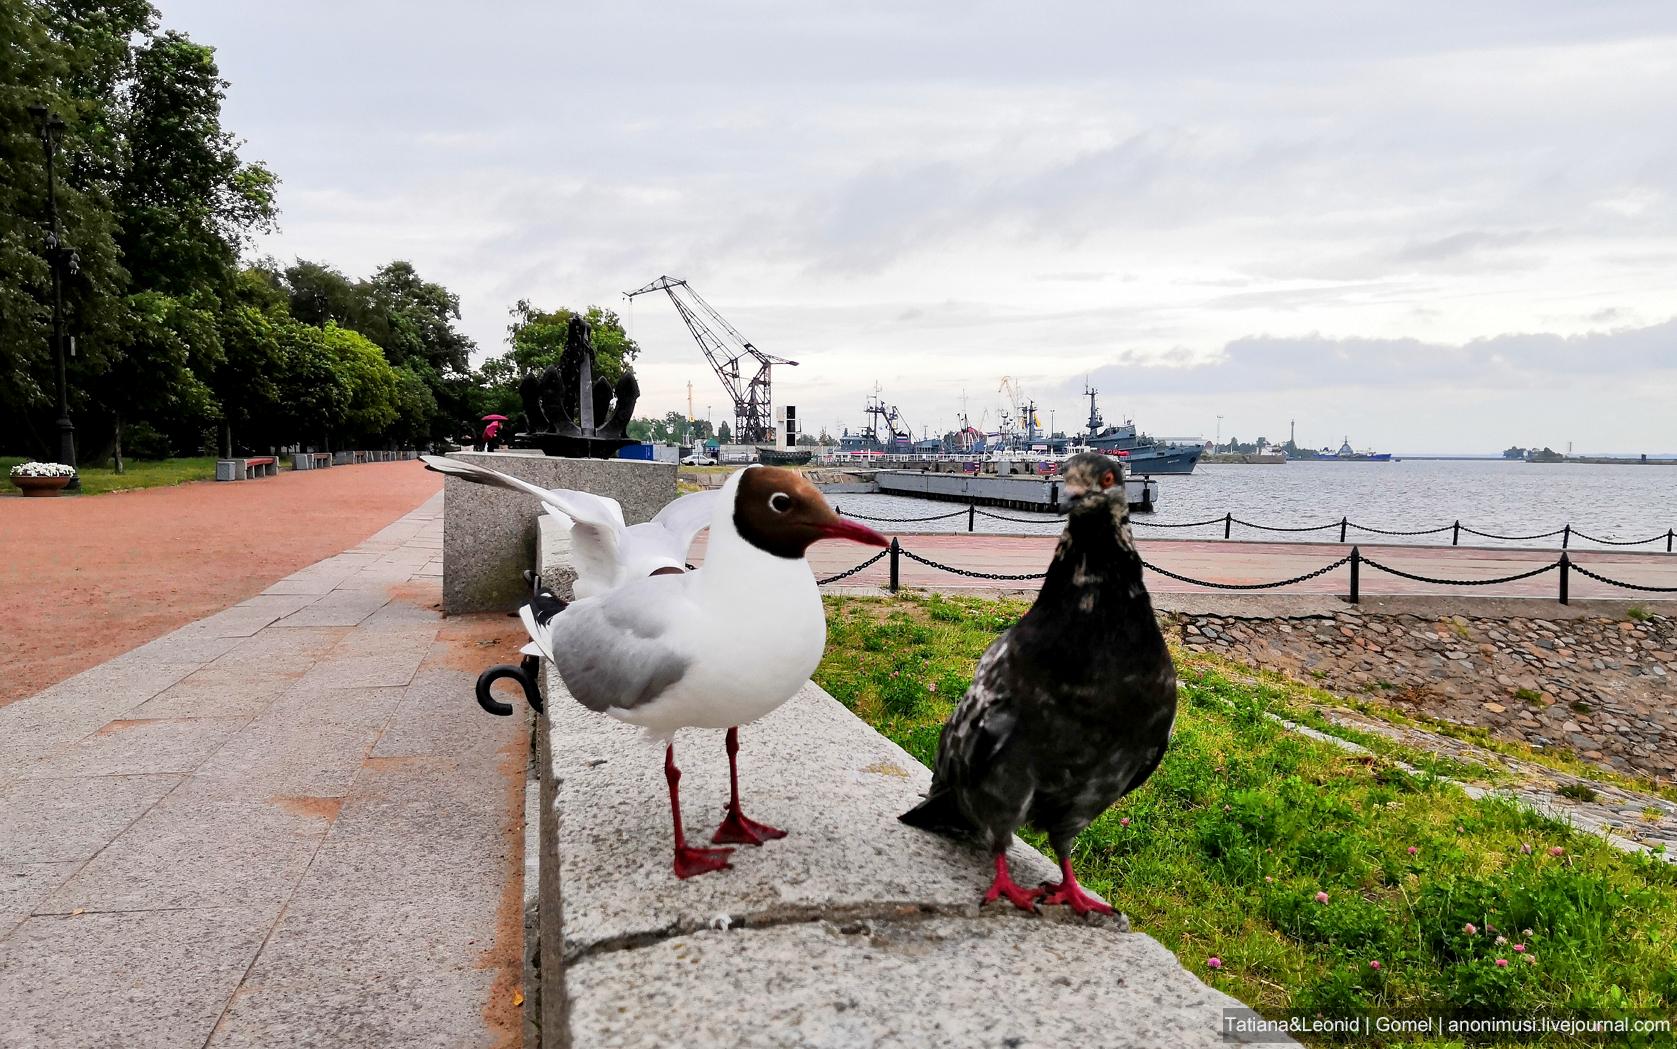 Чайки - символ Санкт-Петербурга